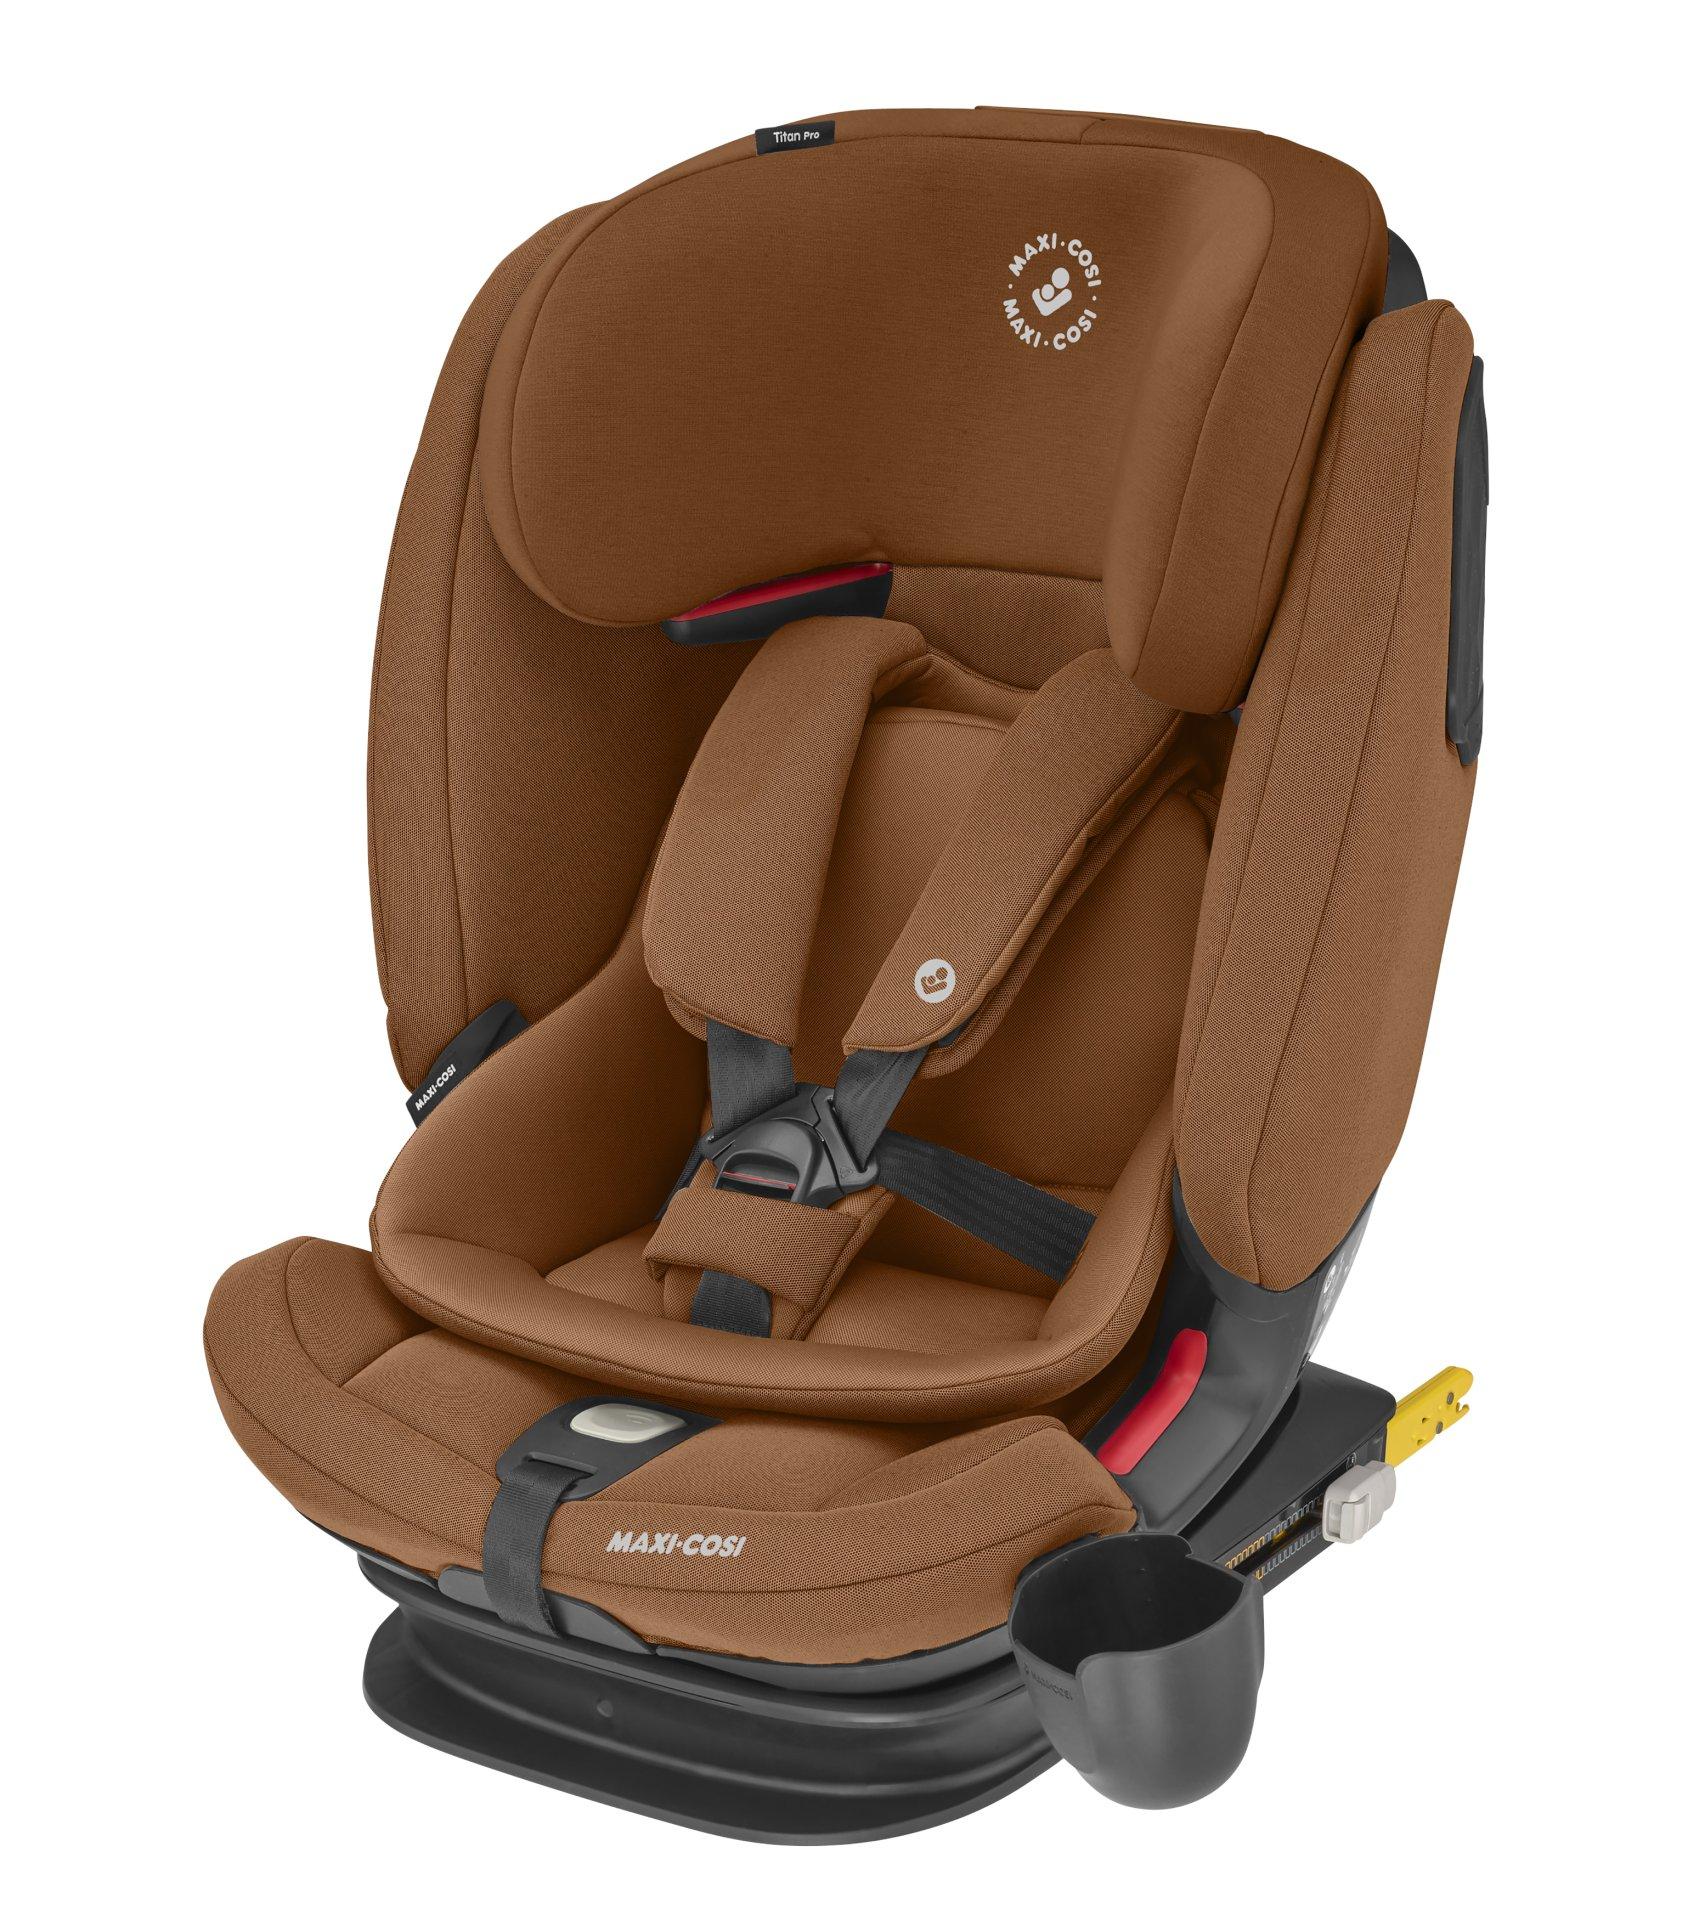 Www Pro Design Com maxi cosi child car seat titan pro